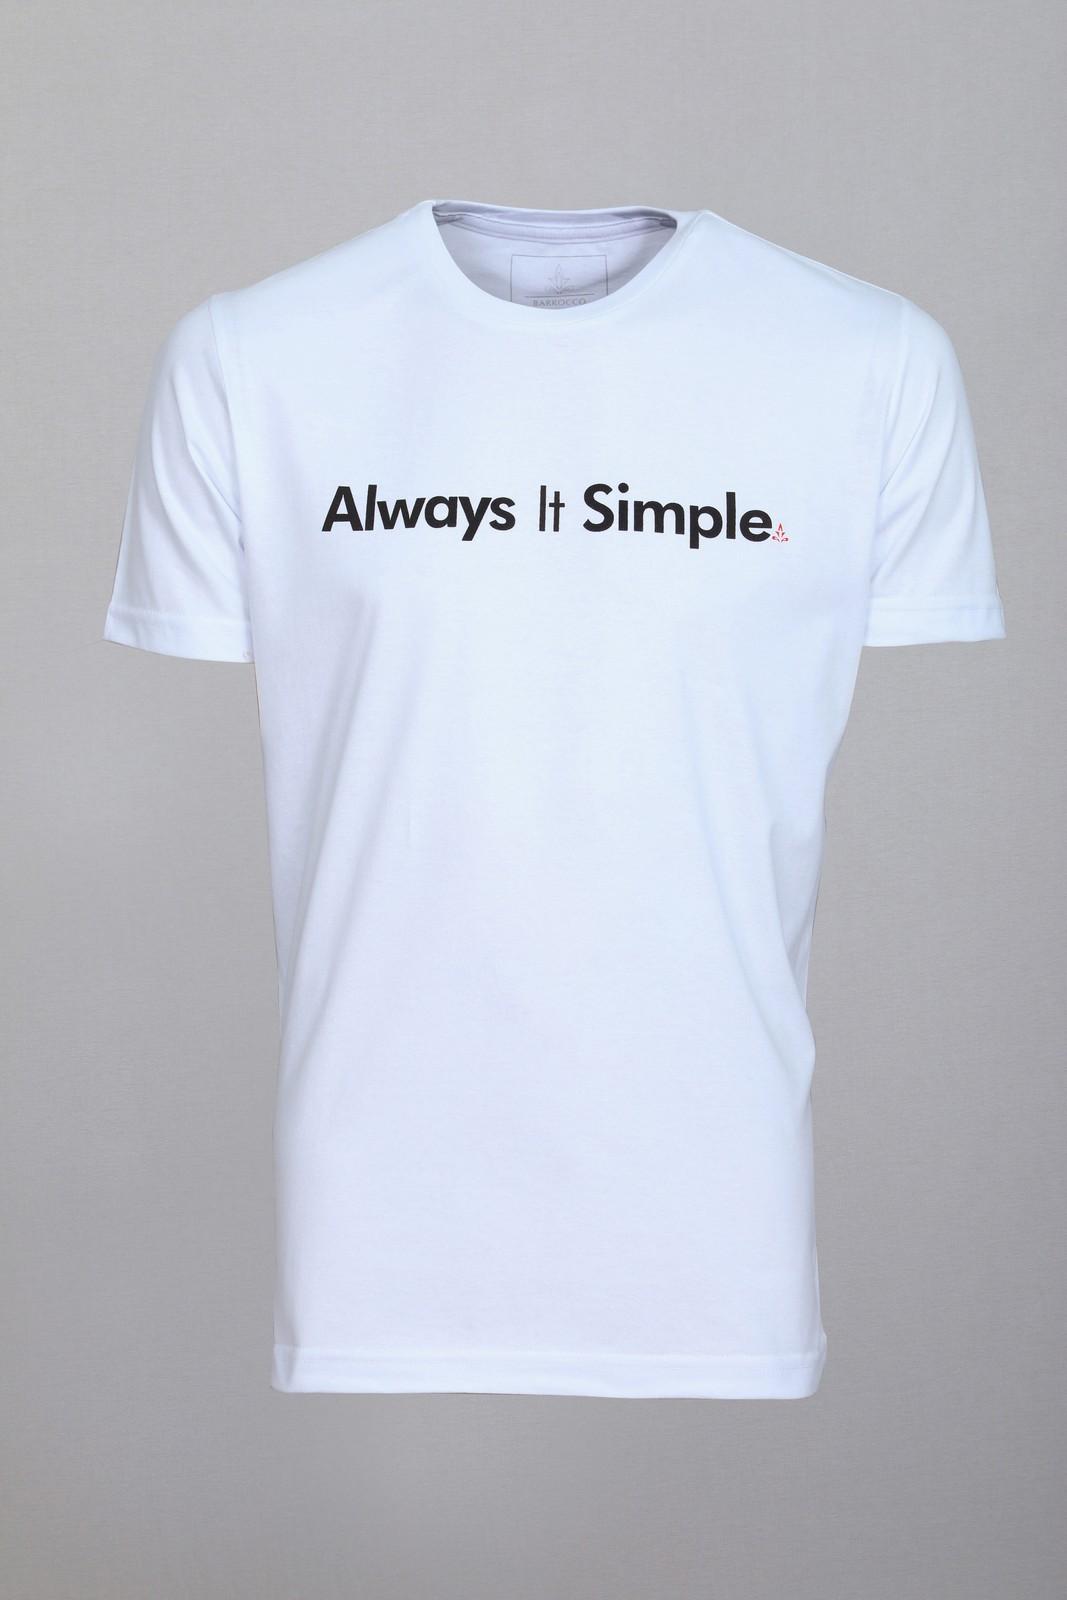 Camiseta Barrocco Always It Simple